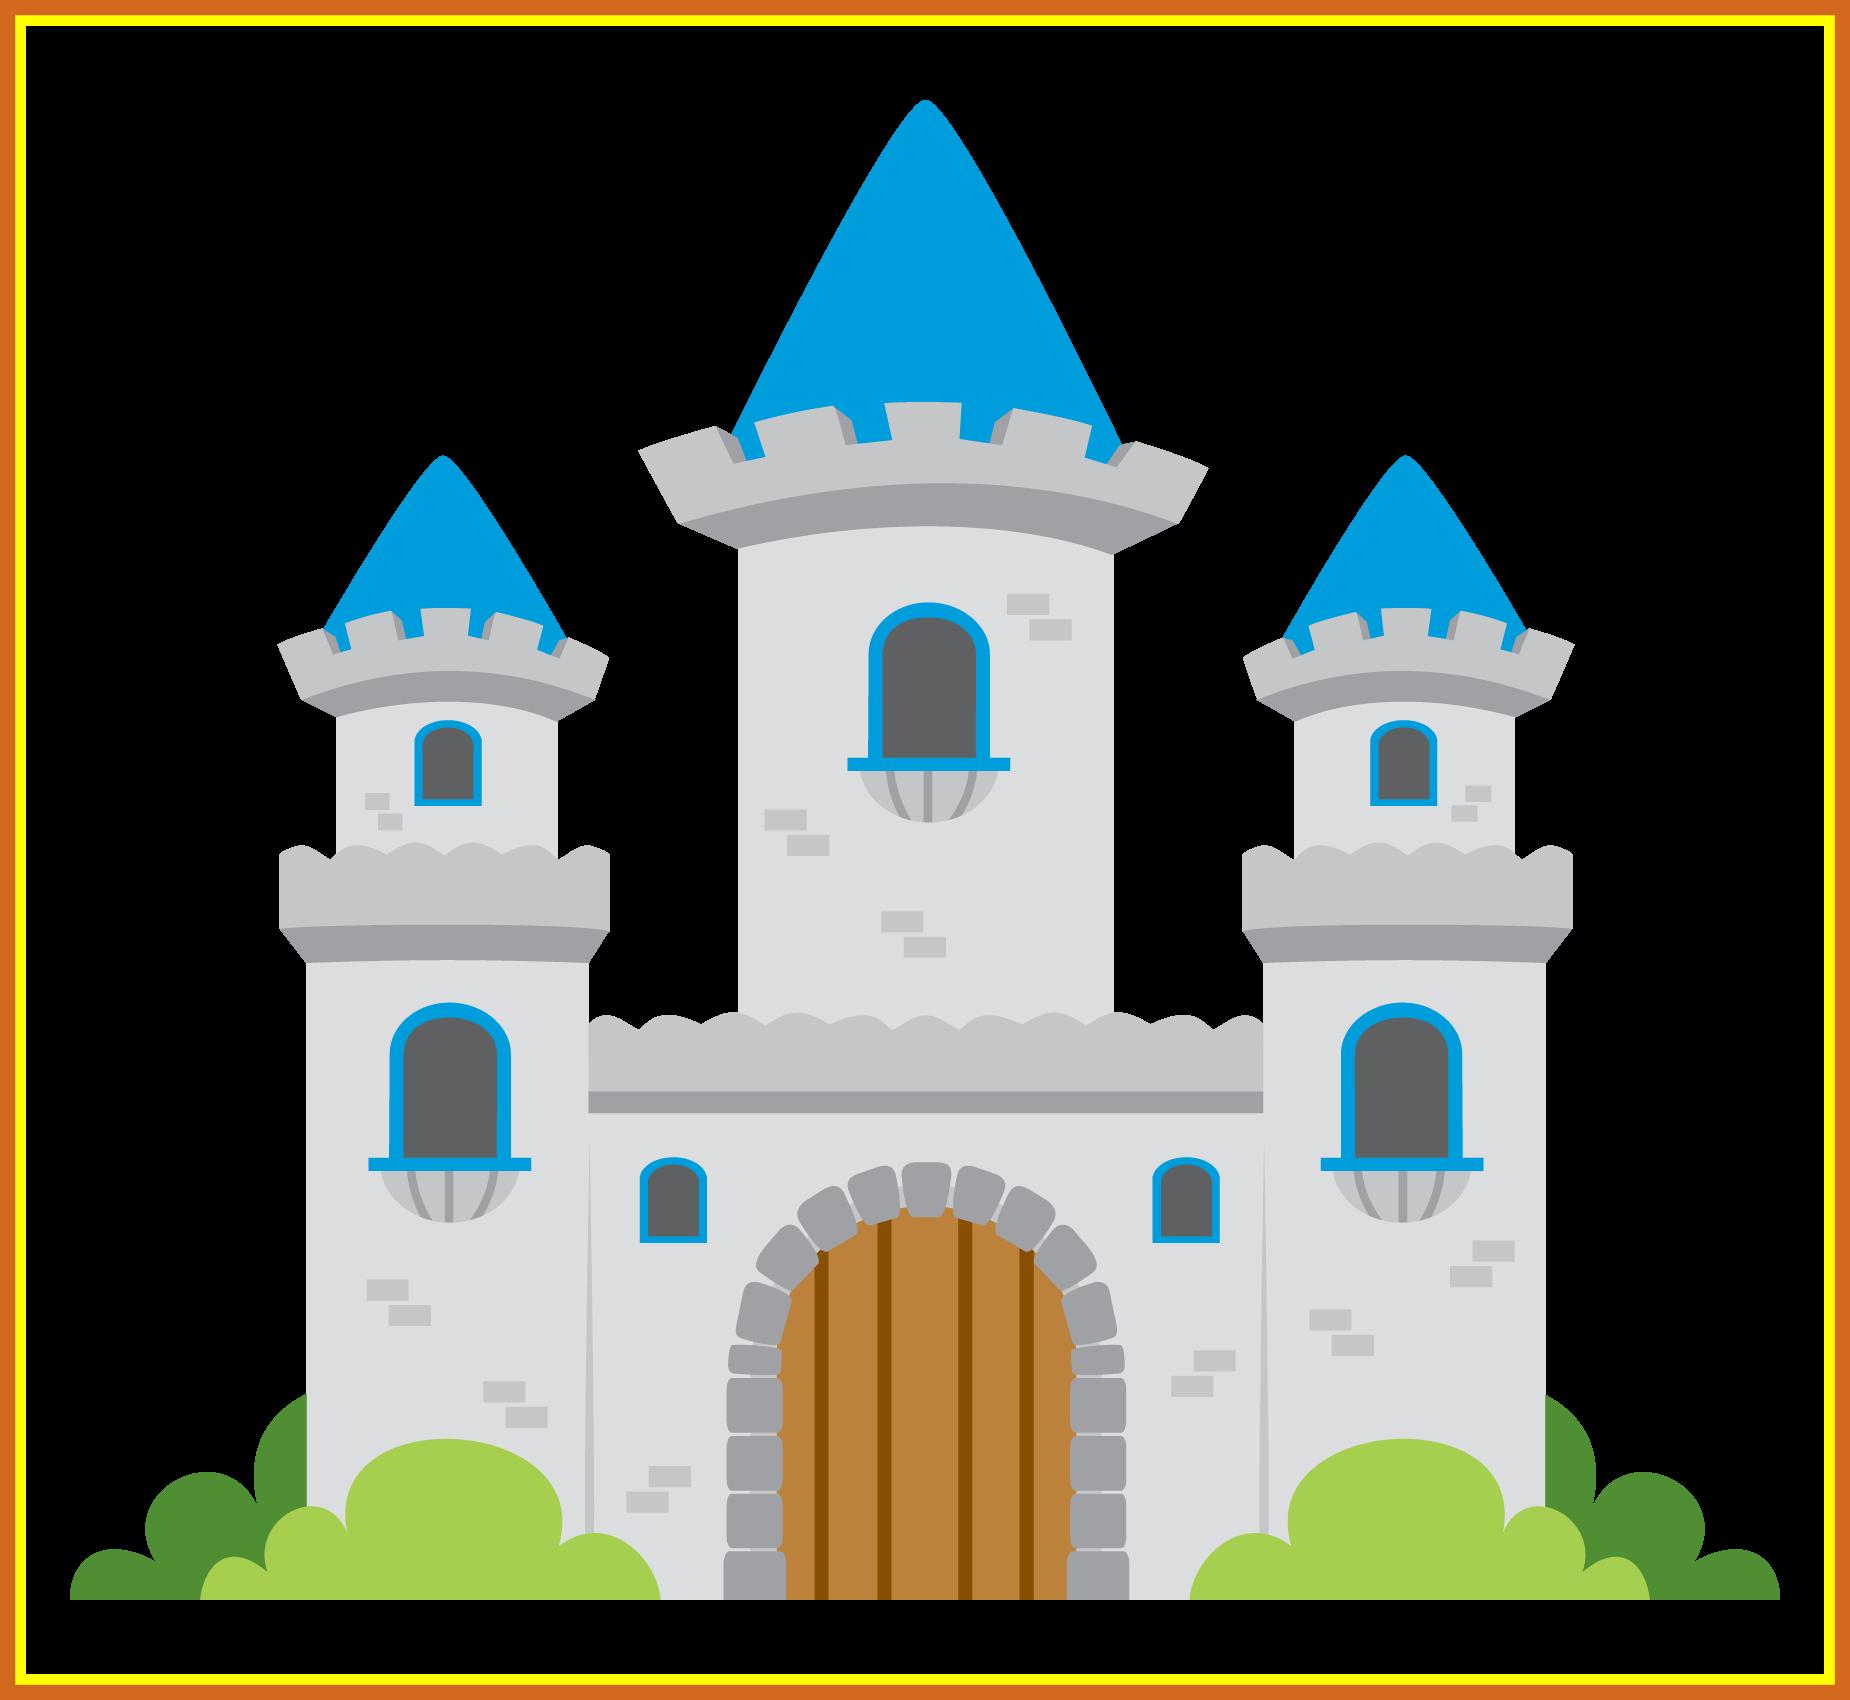 Marvelous fairy tale clip. Fairytale clipart castle